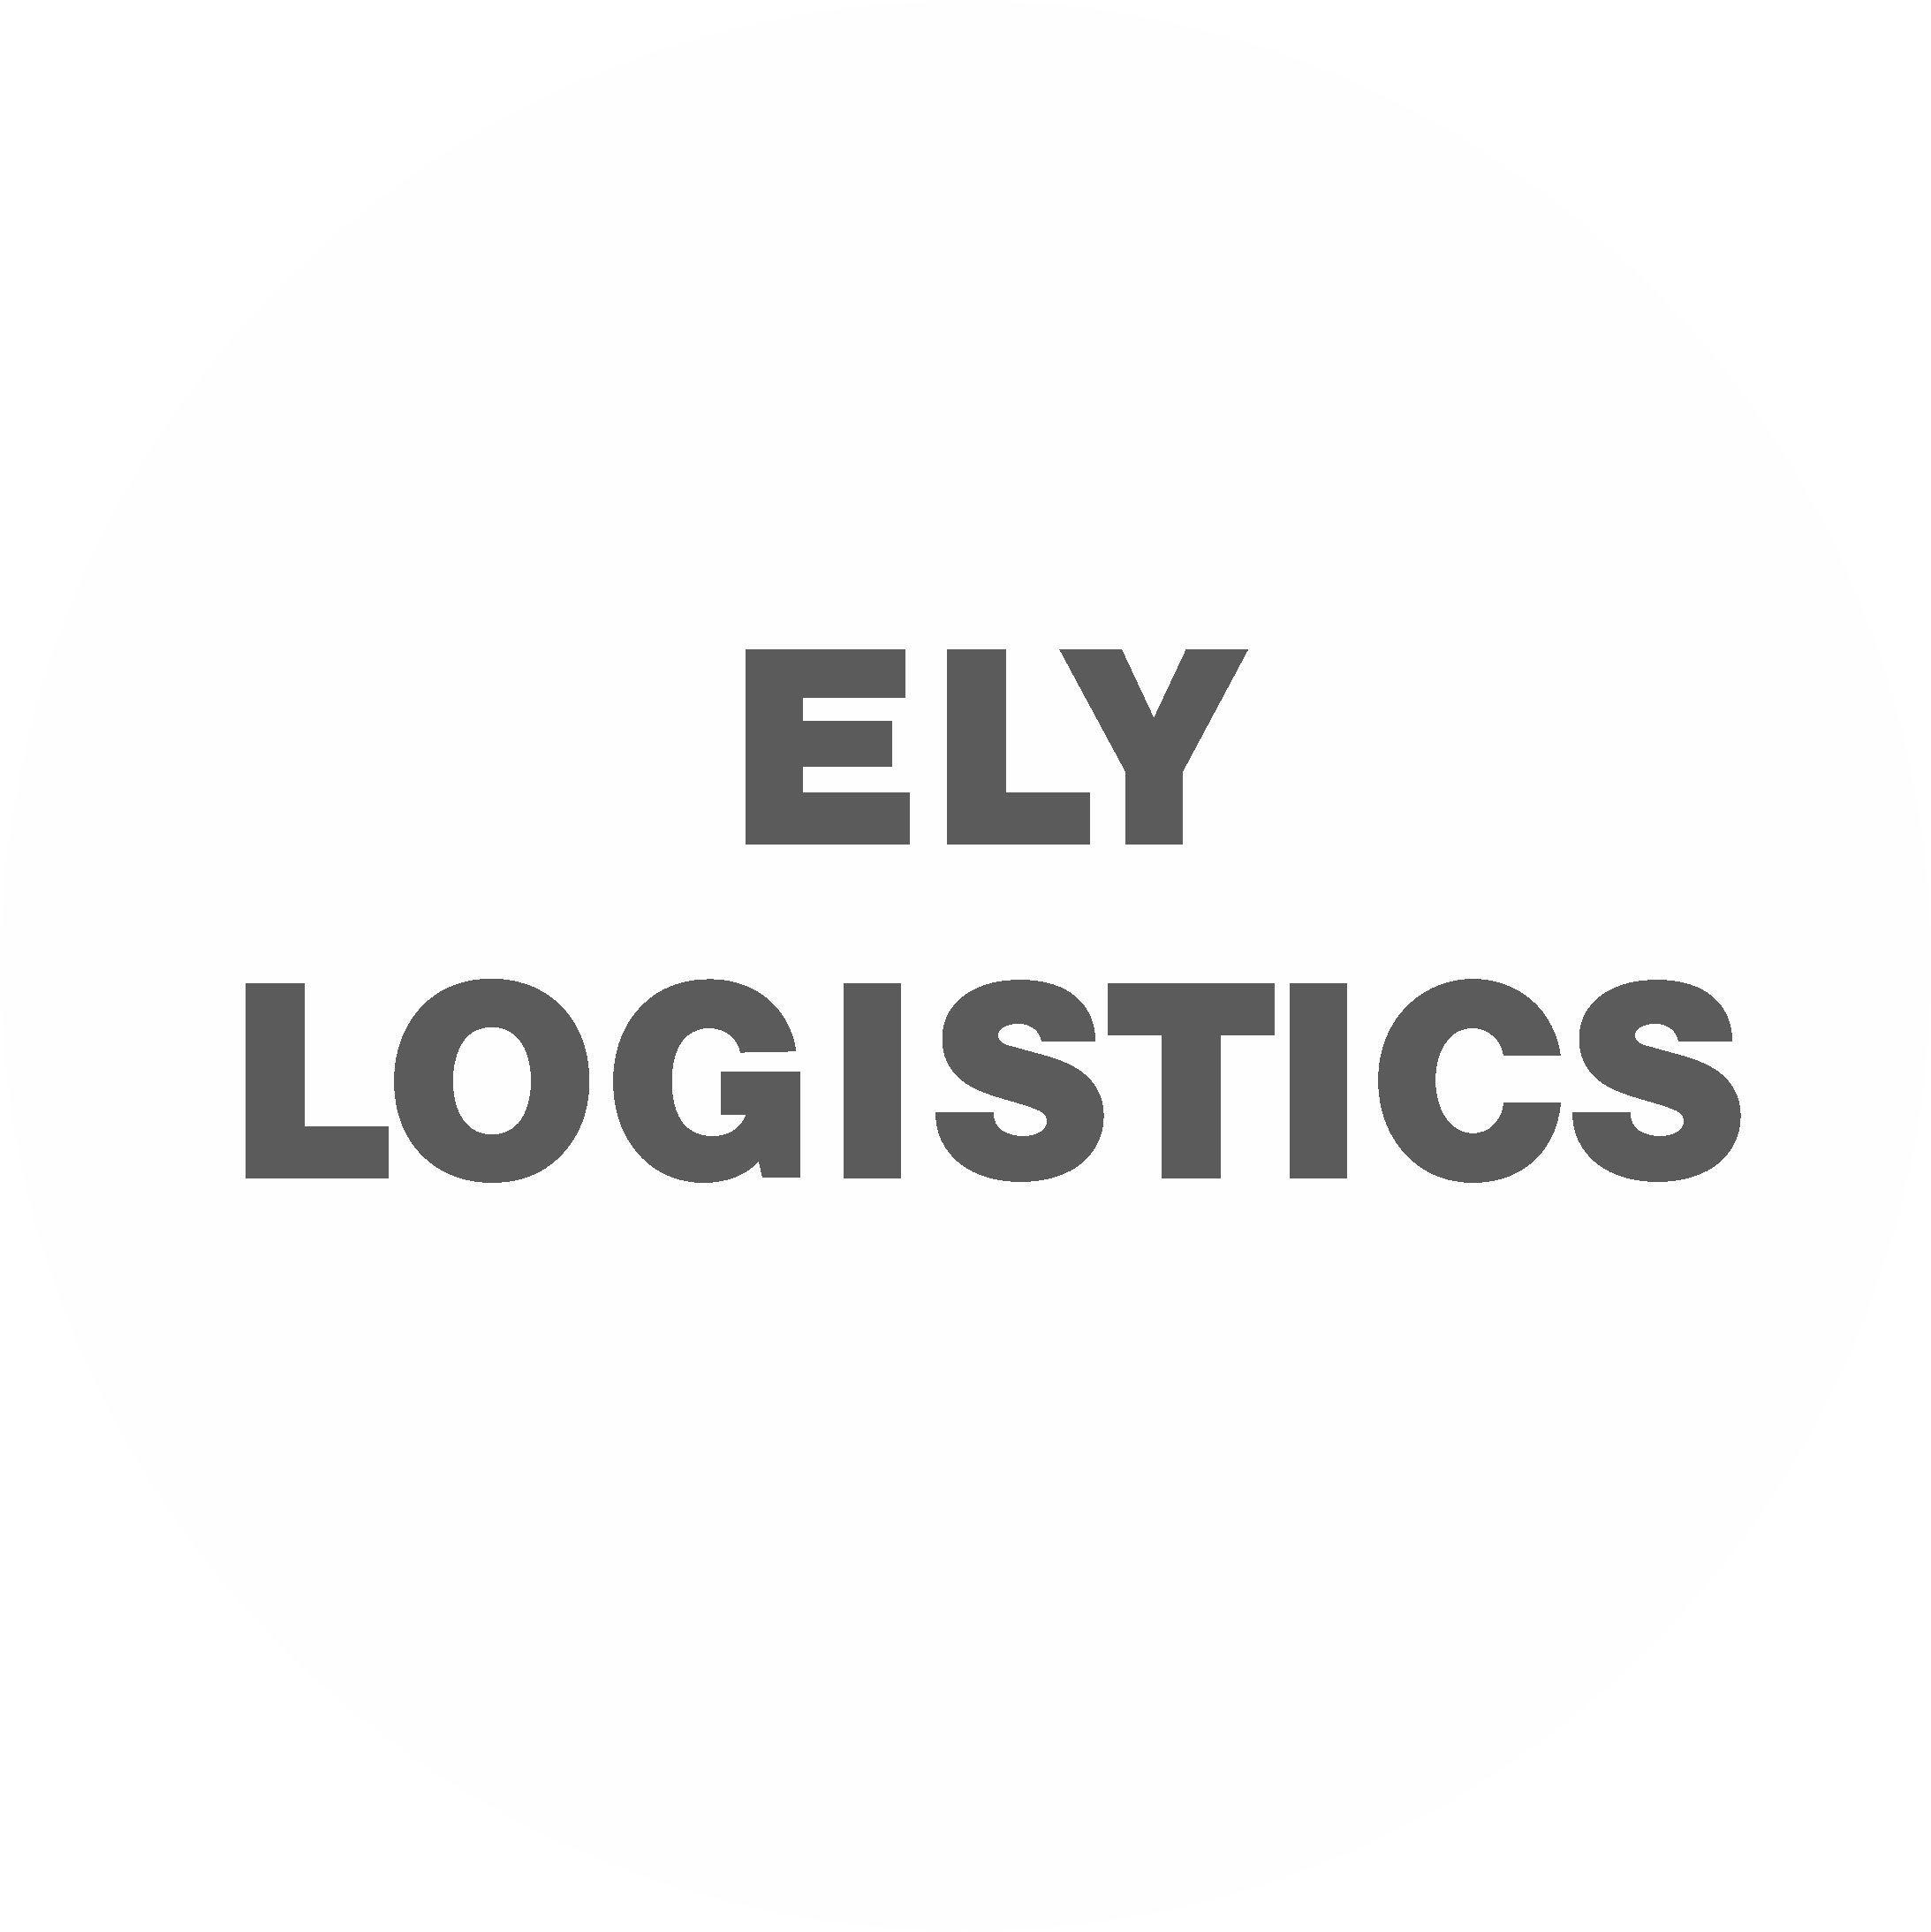 Tom Gunn- Ely Logistics